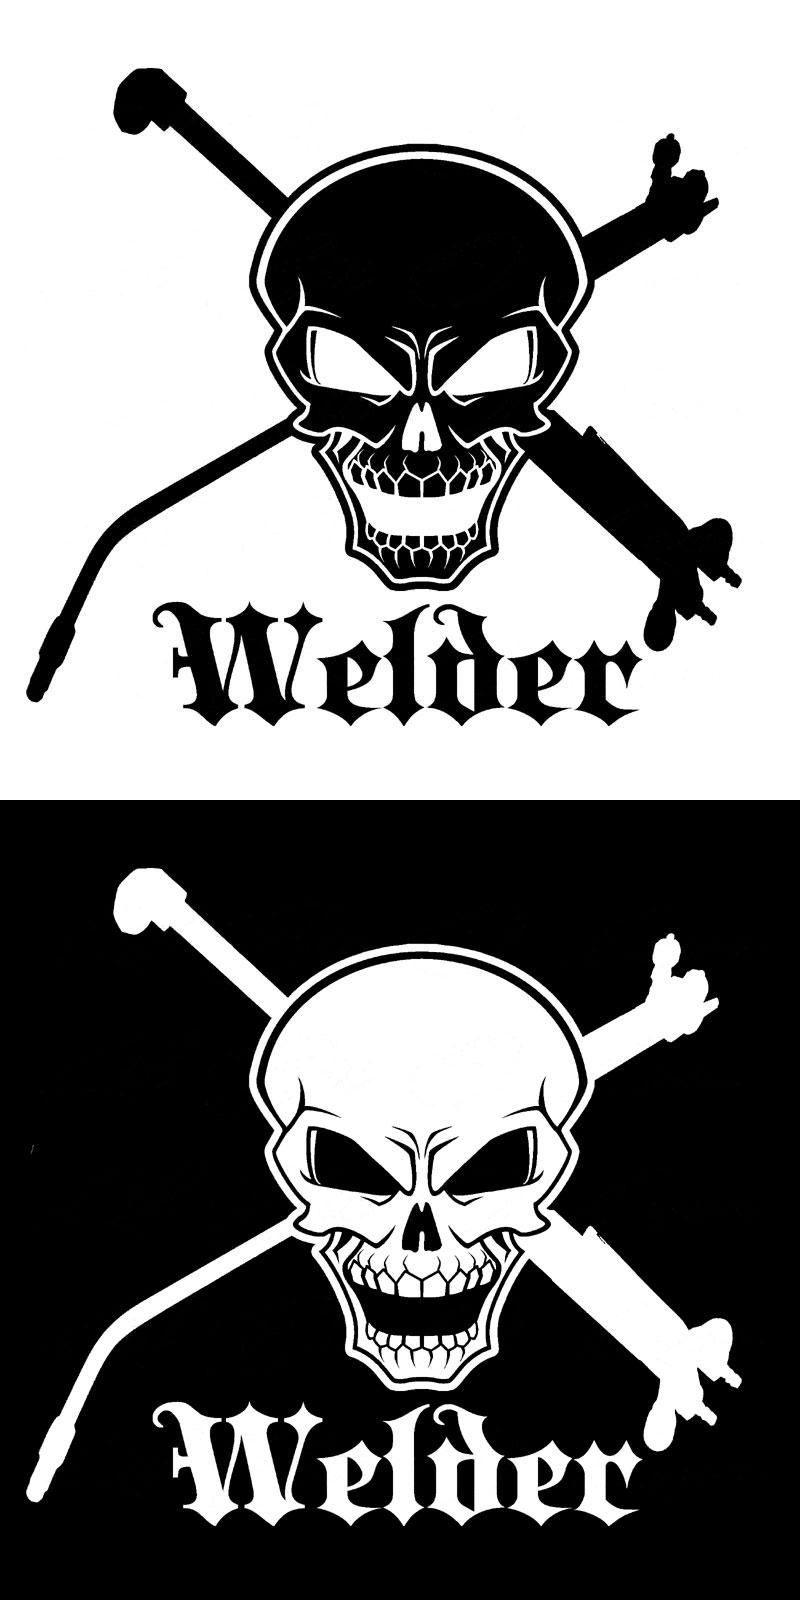 Visit To Buy 17 8cm 16 6cm Skull And Cross Tools Welder Vinyl Welding Weld Car Motorcycle Car Accessories Car Stick Woodburning Projects Welders Cricut Vinyl